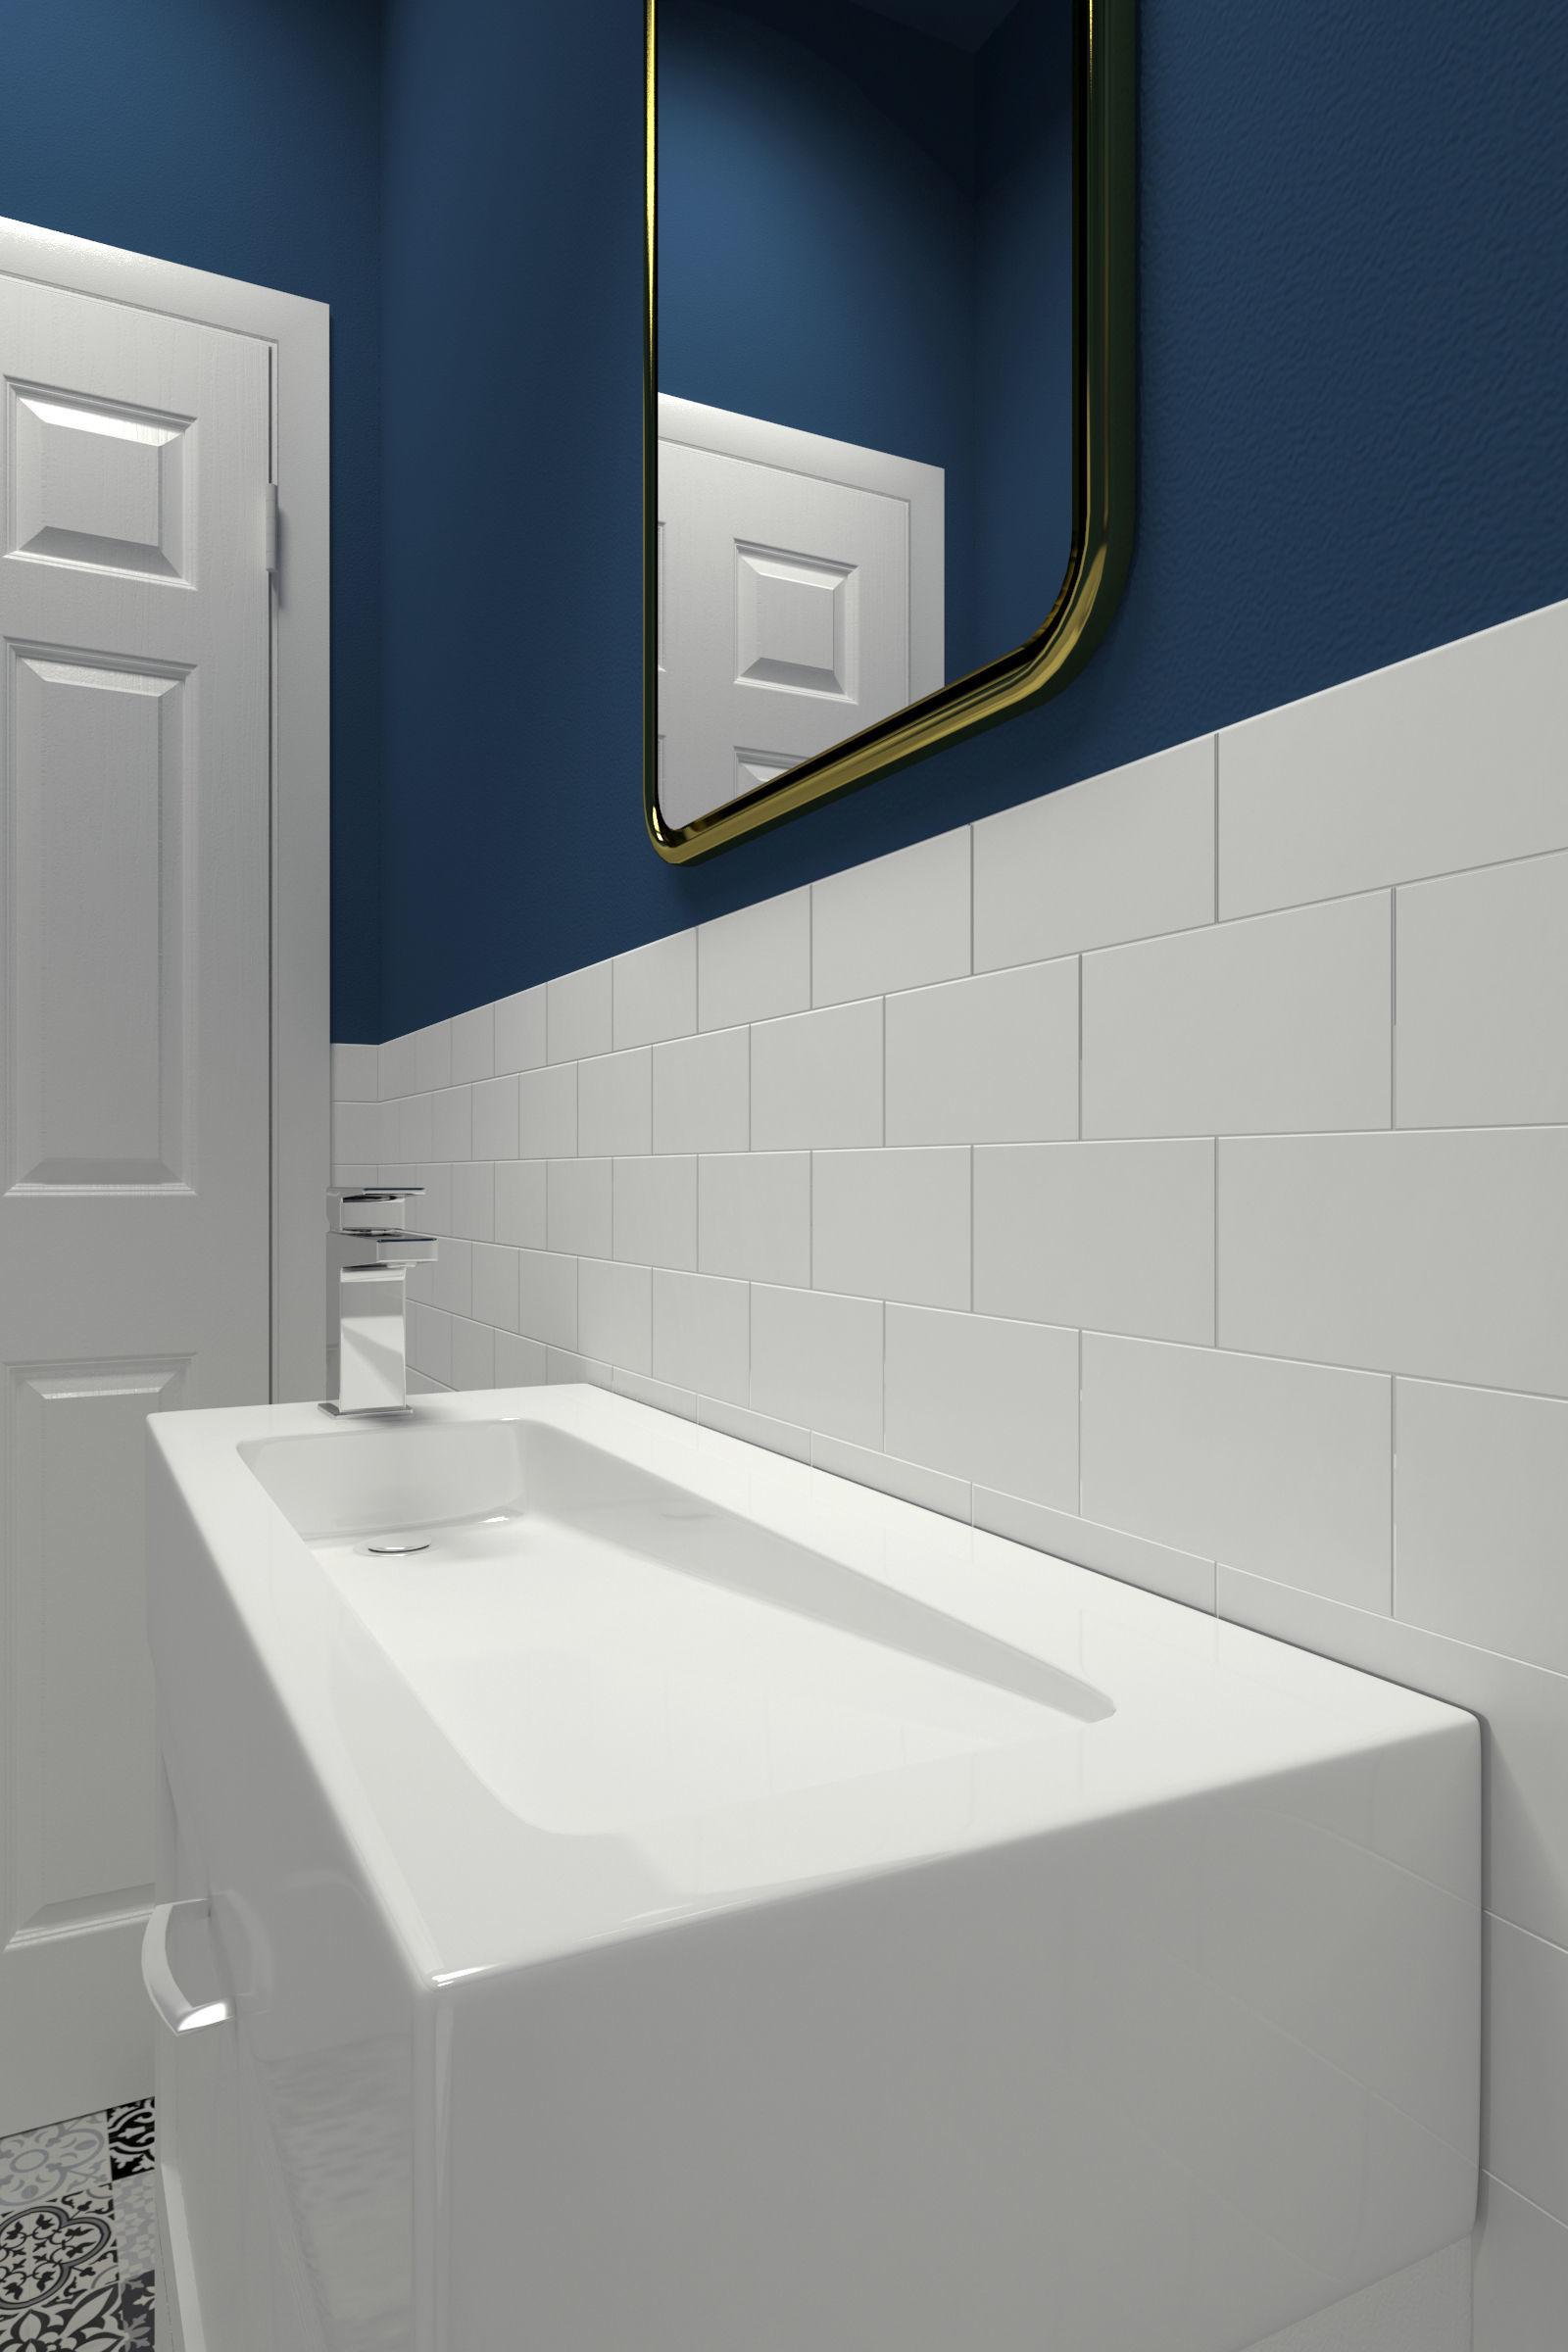 Bathroom-003 Powder Room 3D model | CGTrader